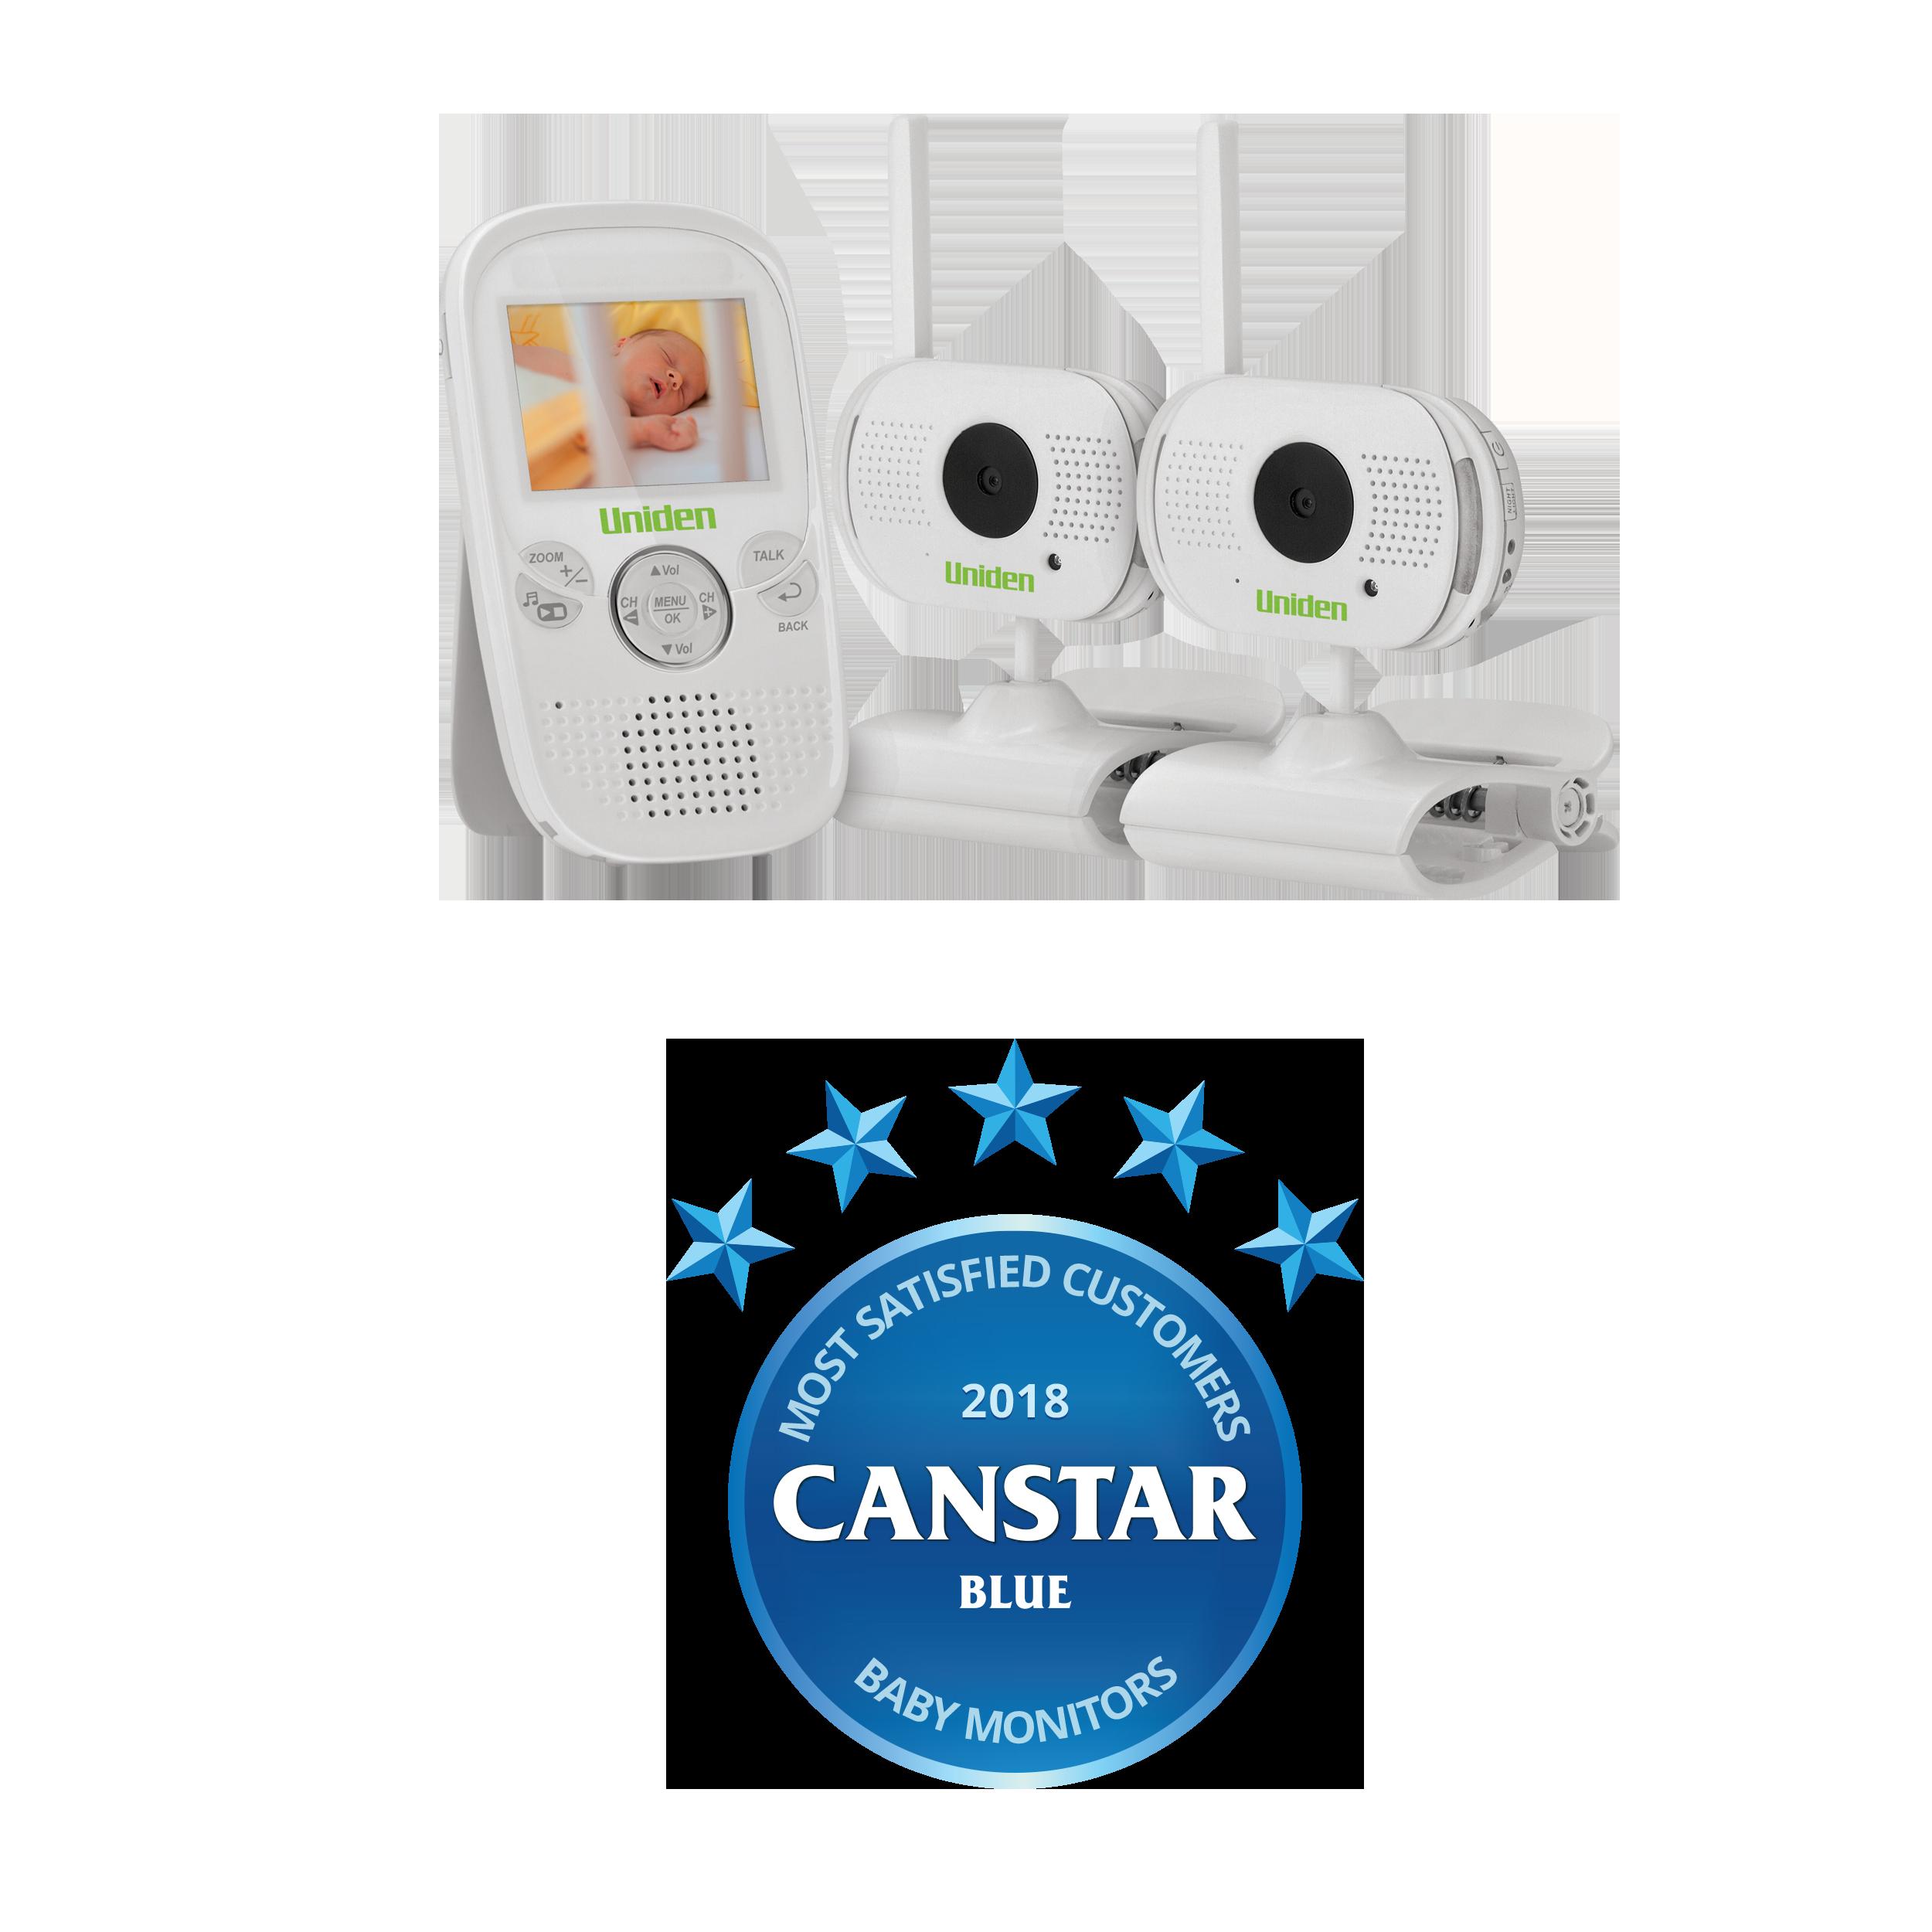 BW 3002 (Canstar)